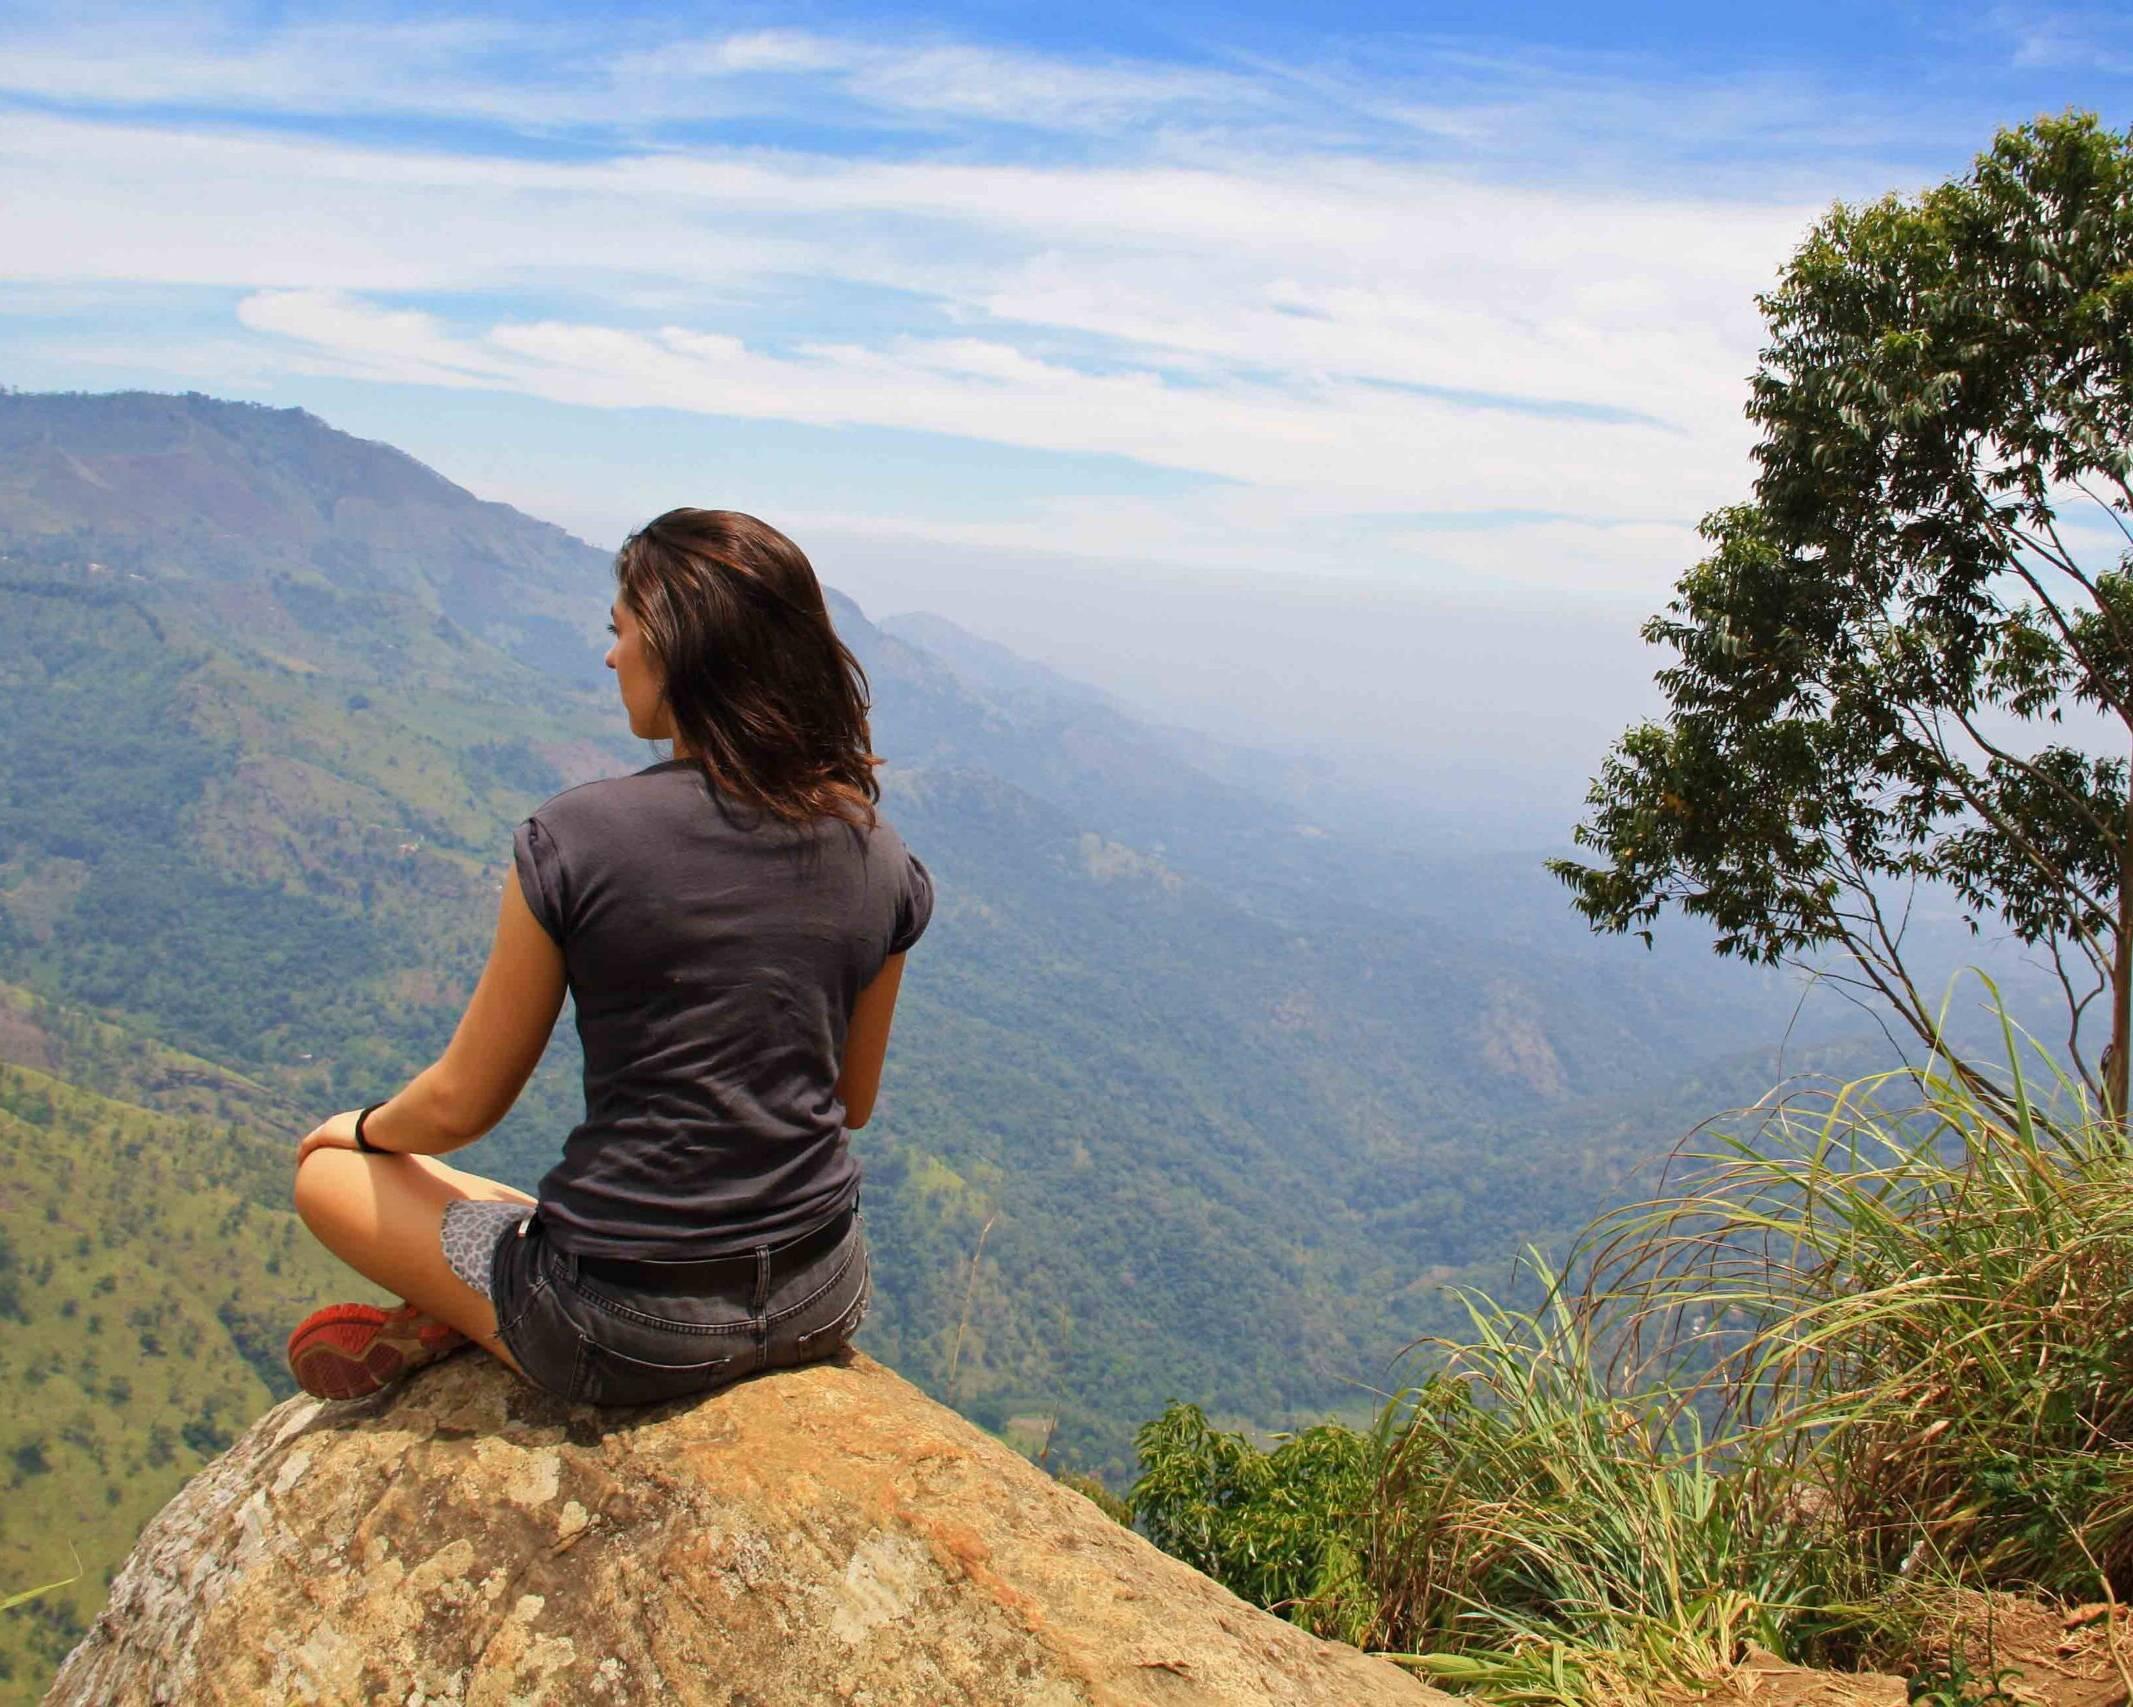 ella rock view climbing mountain sri lanka